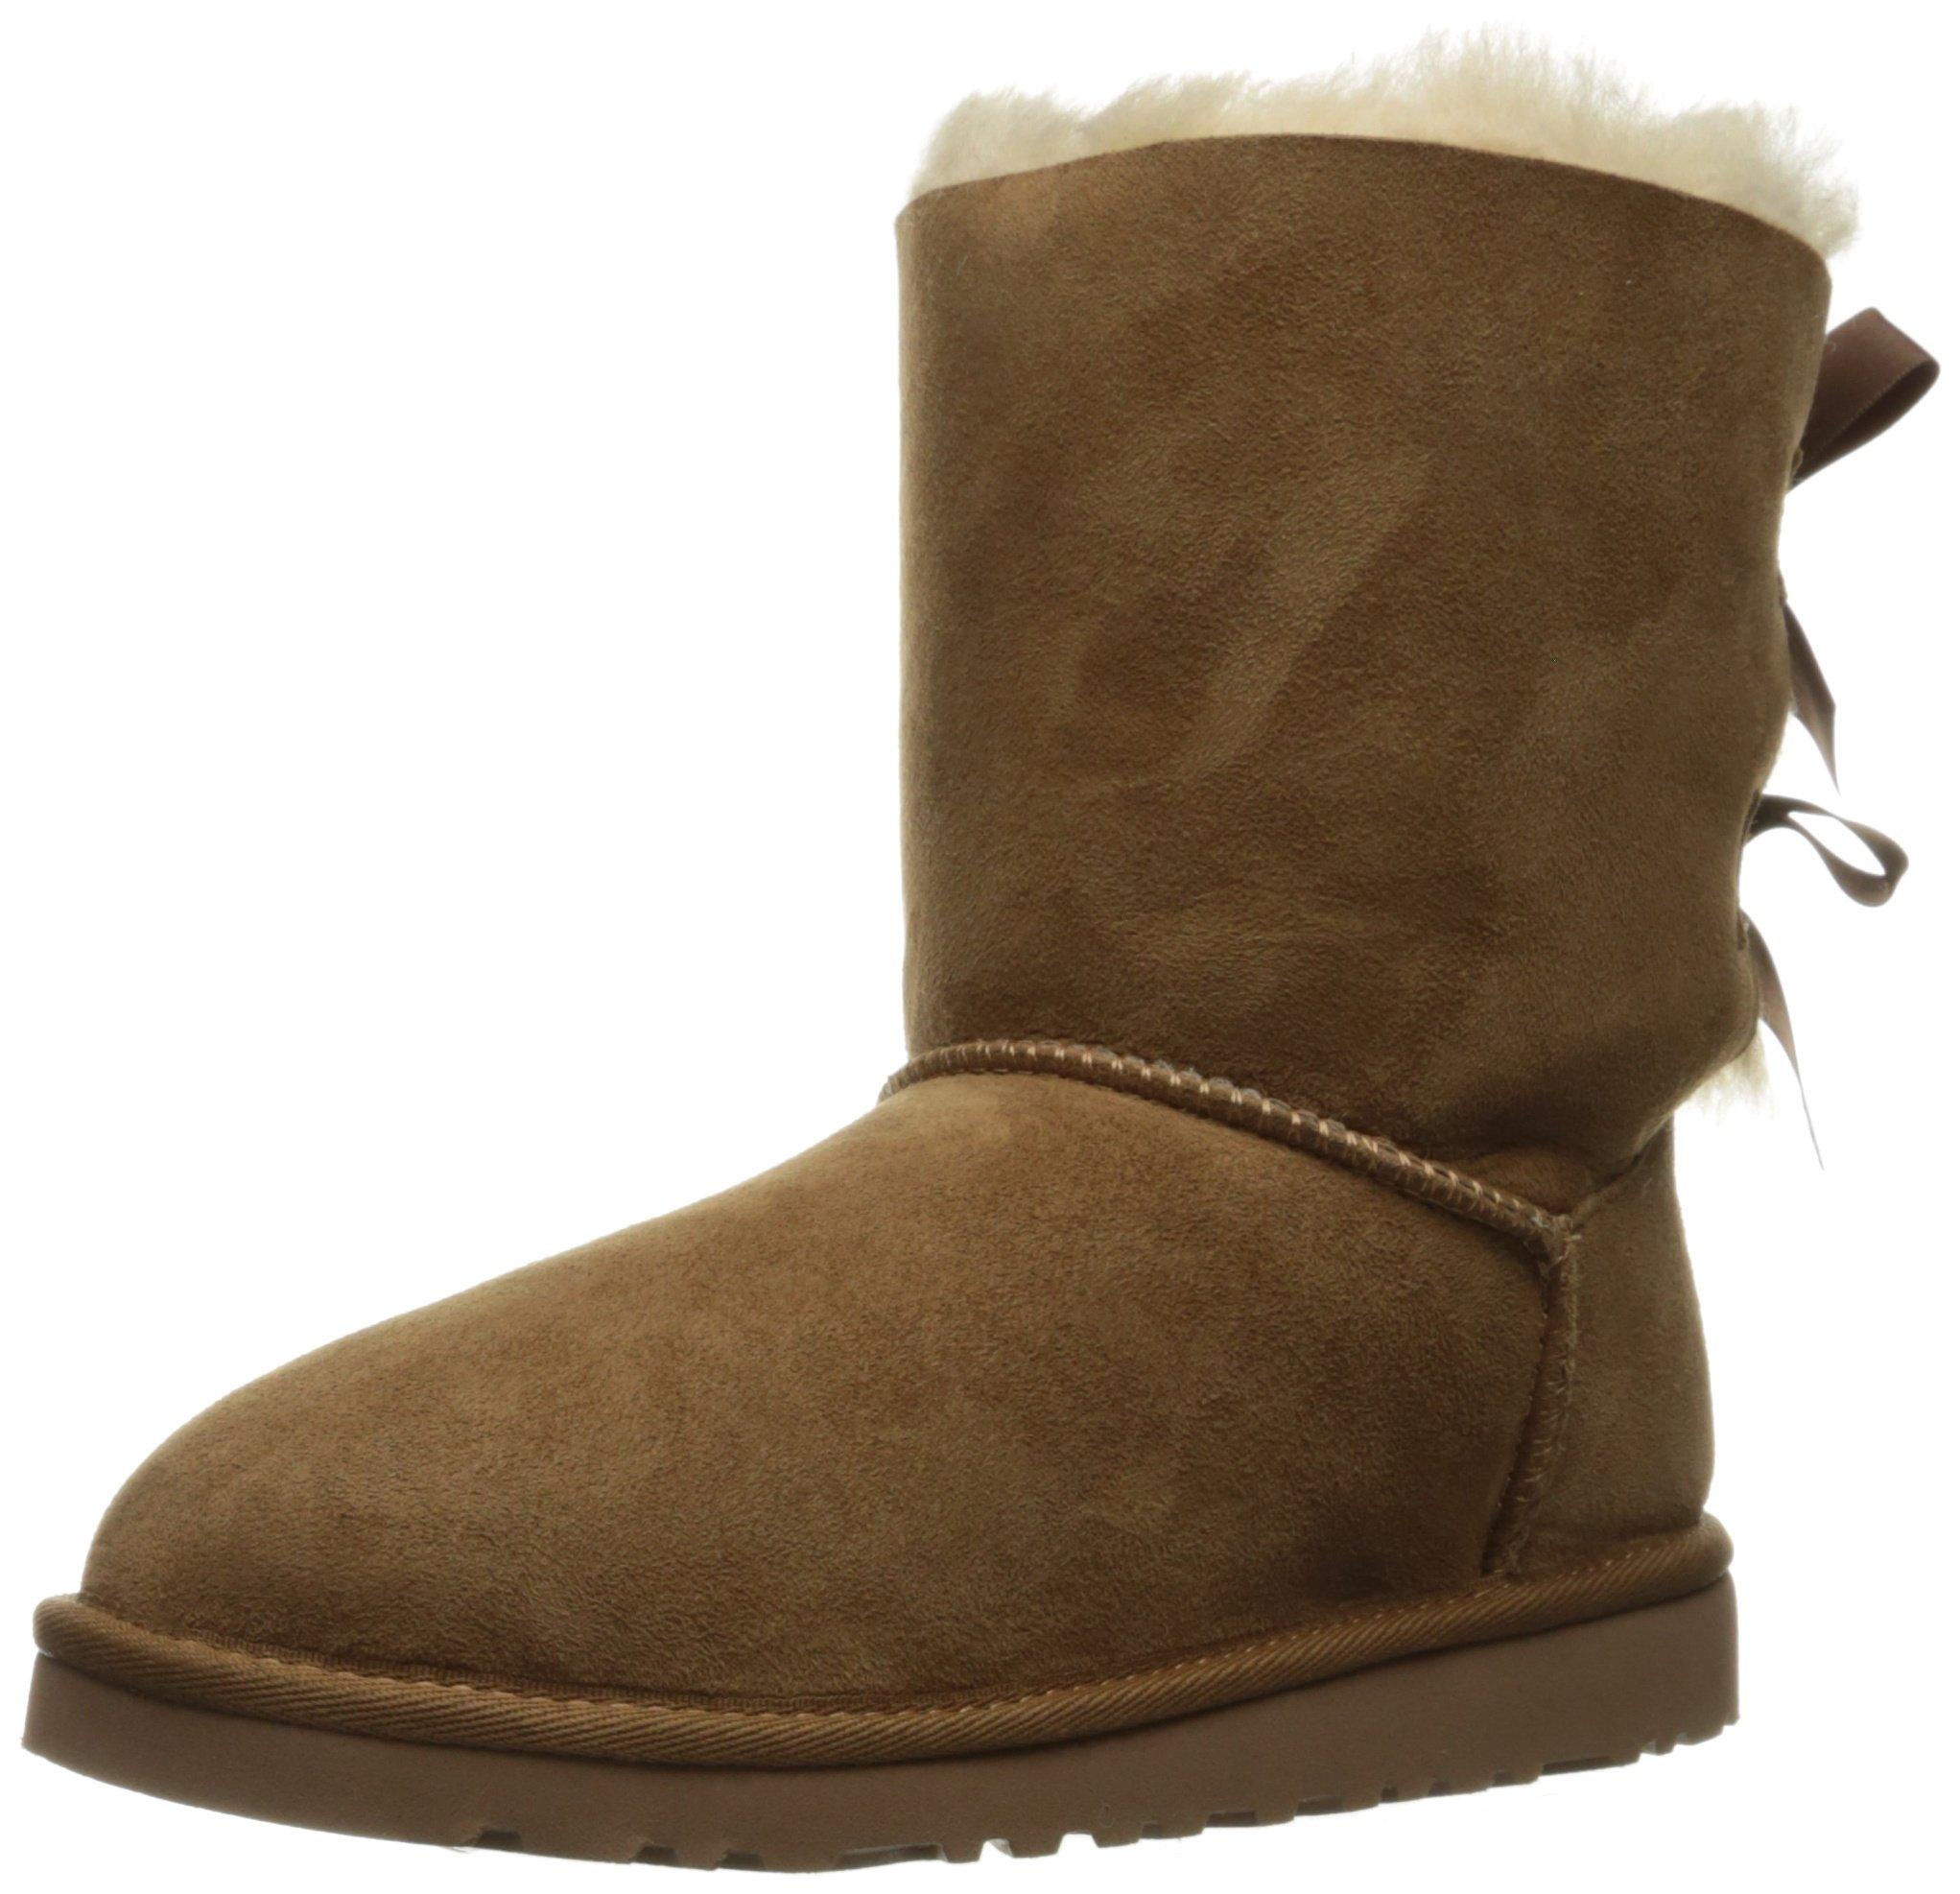 UGG Australia Girls' Bailey Bow Sheepskin Fashion Boot Chestnut 5 M US